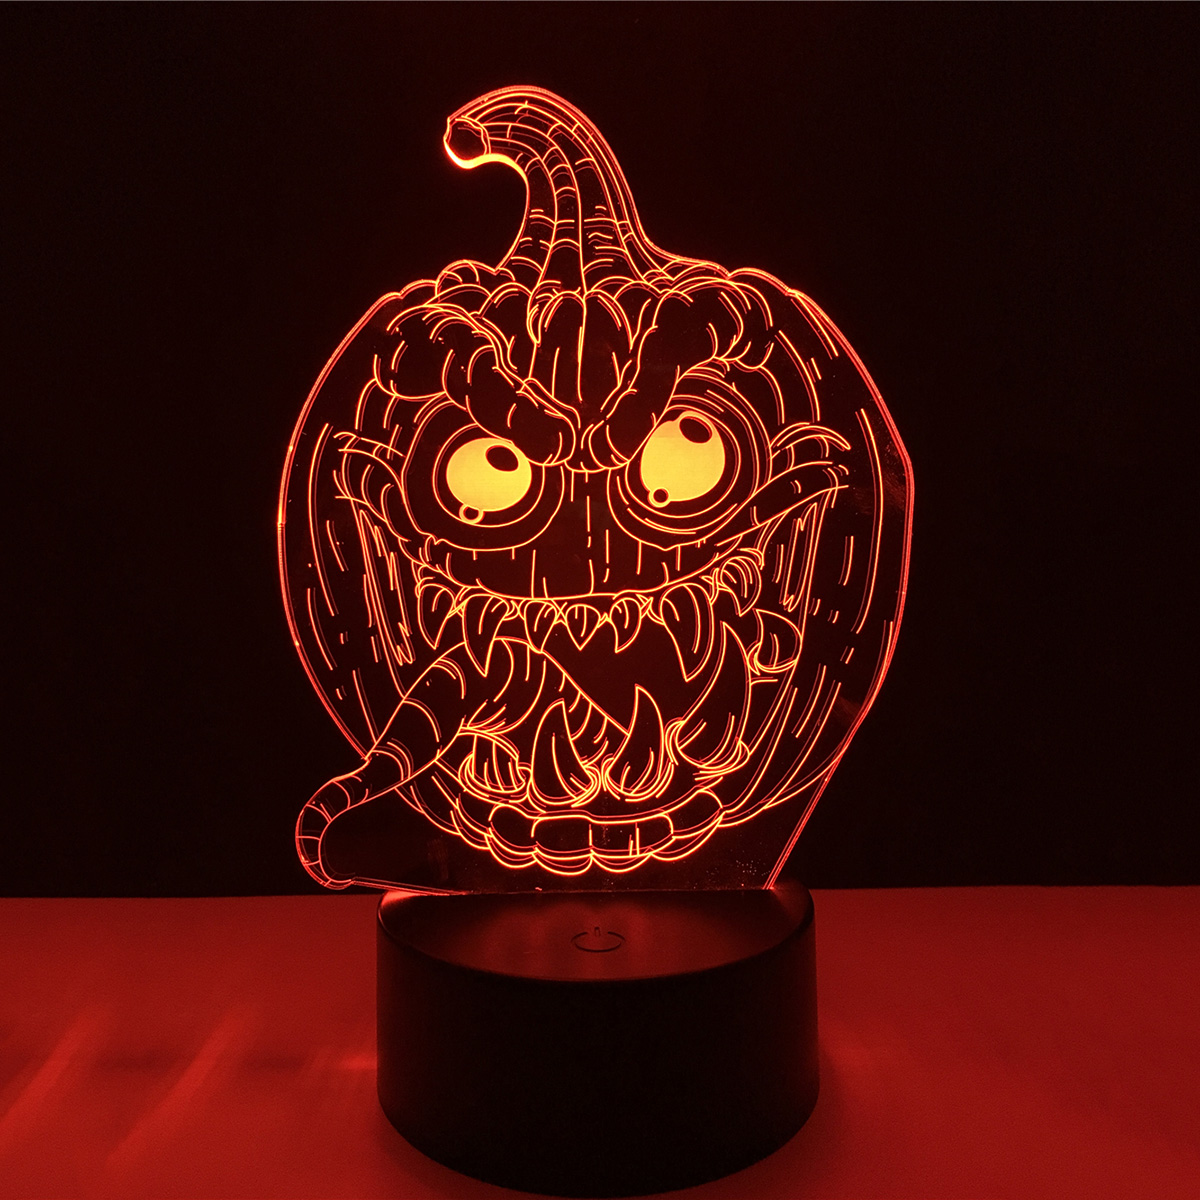 Halloween 3D Pumpkin Horror Face Acrylic LED Lamp 3D Baby Night Light Sleeping Lighting Holiday Night Light Xmas New Years P25